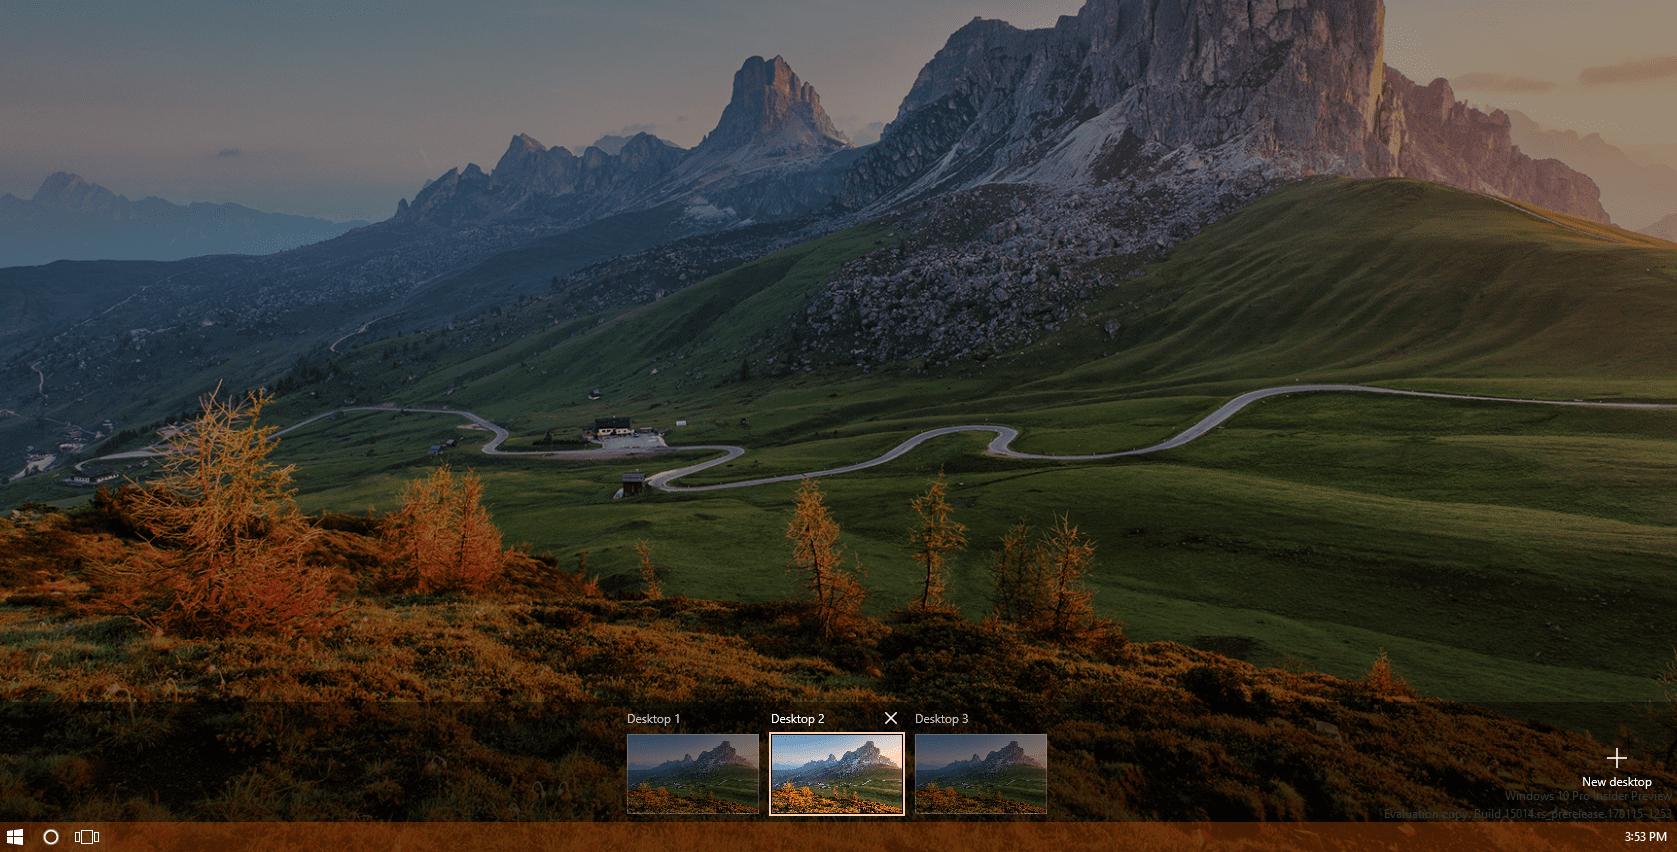 Beautiful Wallpaper Mountain Lock Screen - Windows-10-Desktop-with-Spotlight-image  Best Photo Reference_789743.png?ssl\u003d1